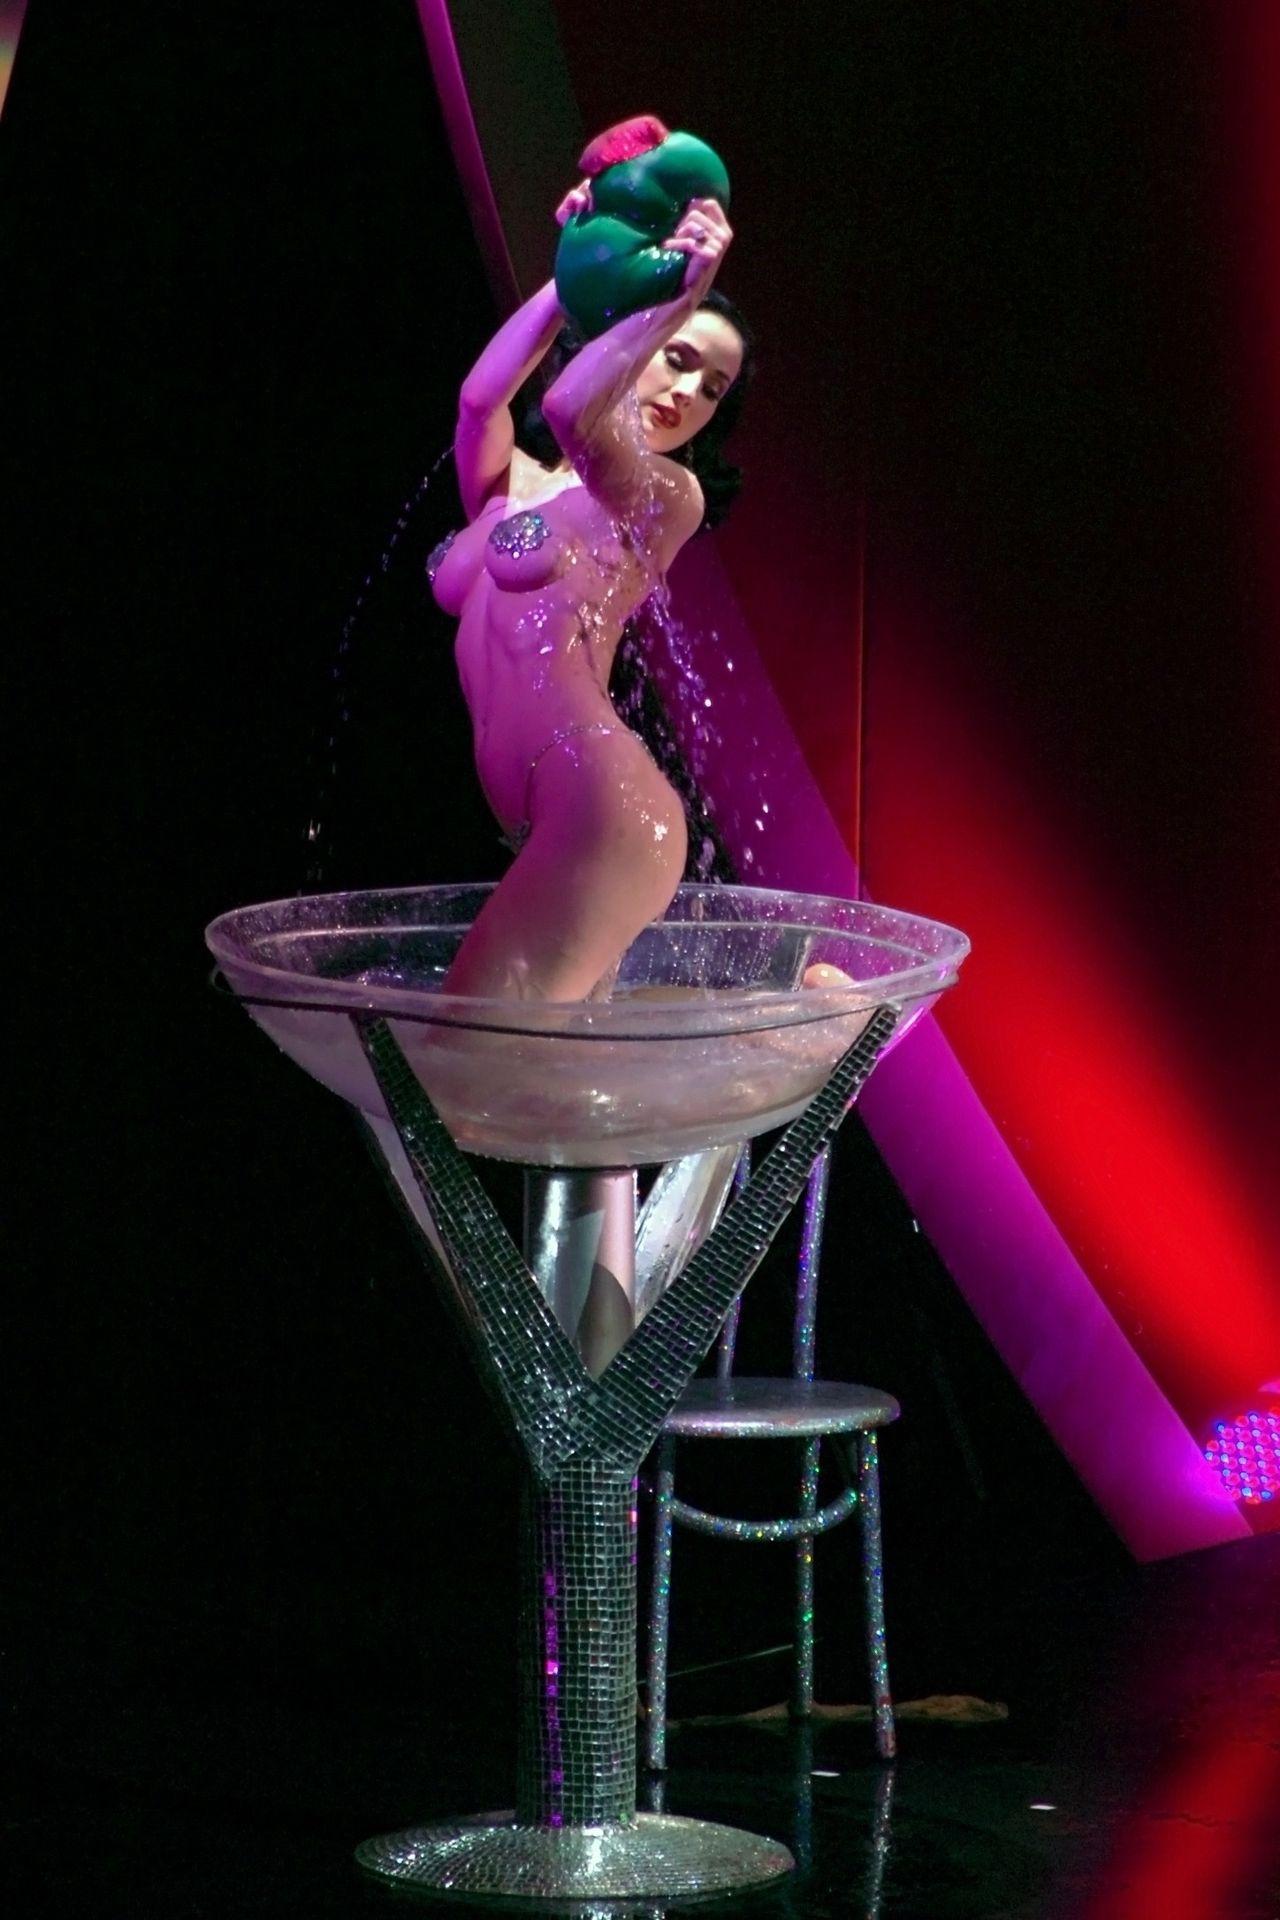 Dita Von Teese Performs At Erotica 06 In London 0043